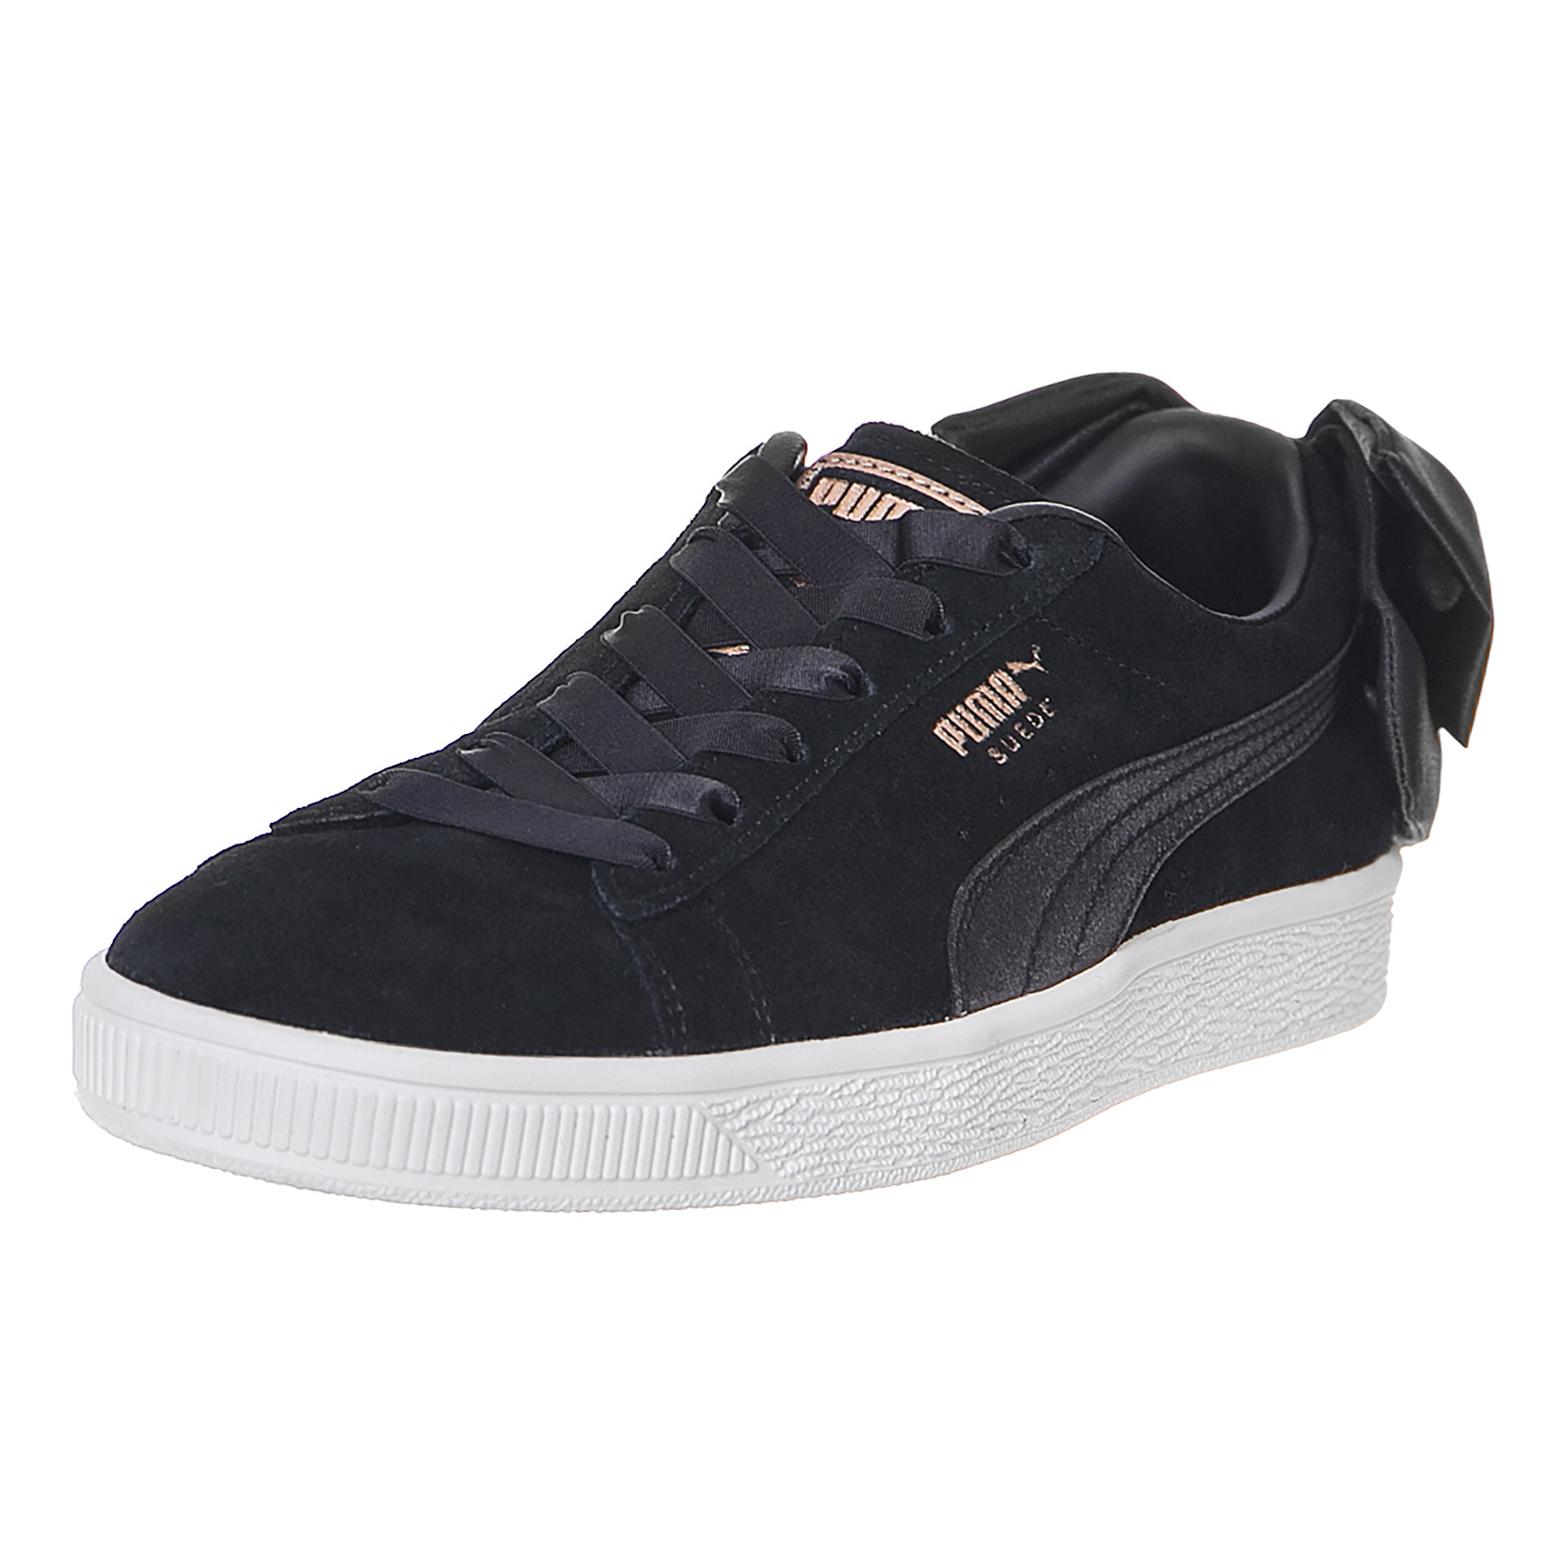 Wn S NoirEbay Daim Black Bow Puma Baskets CtQdrsh